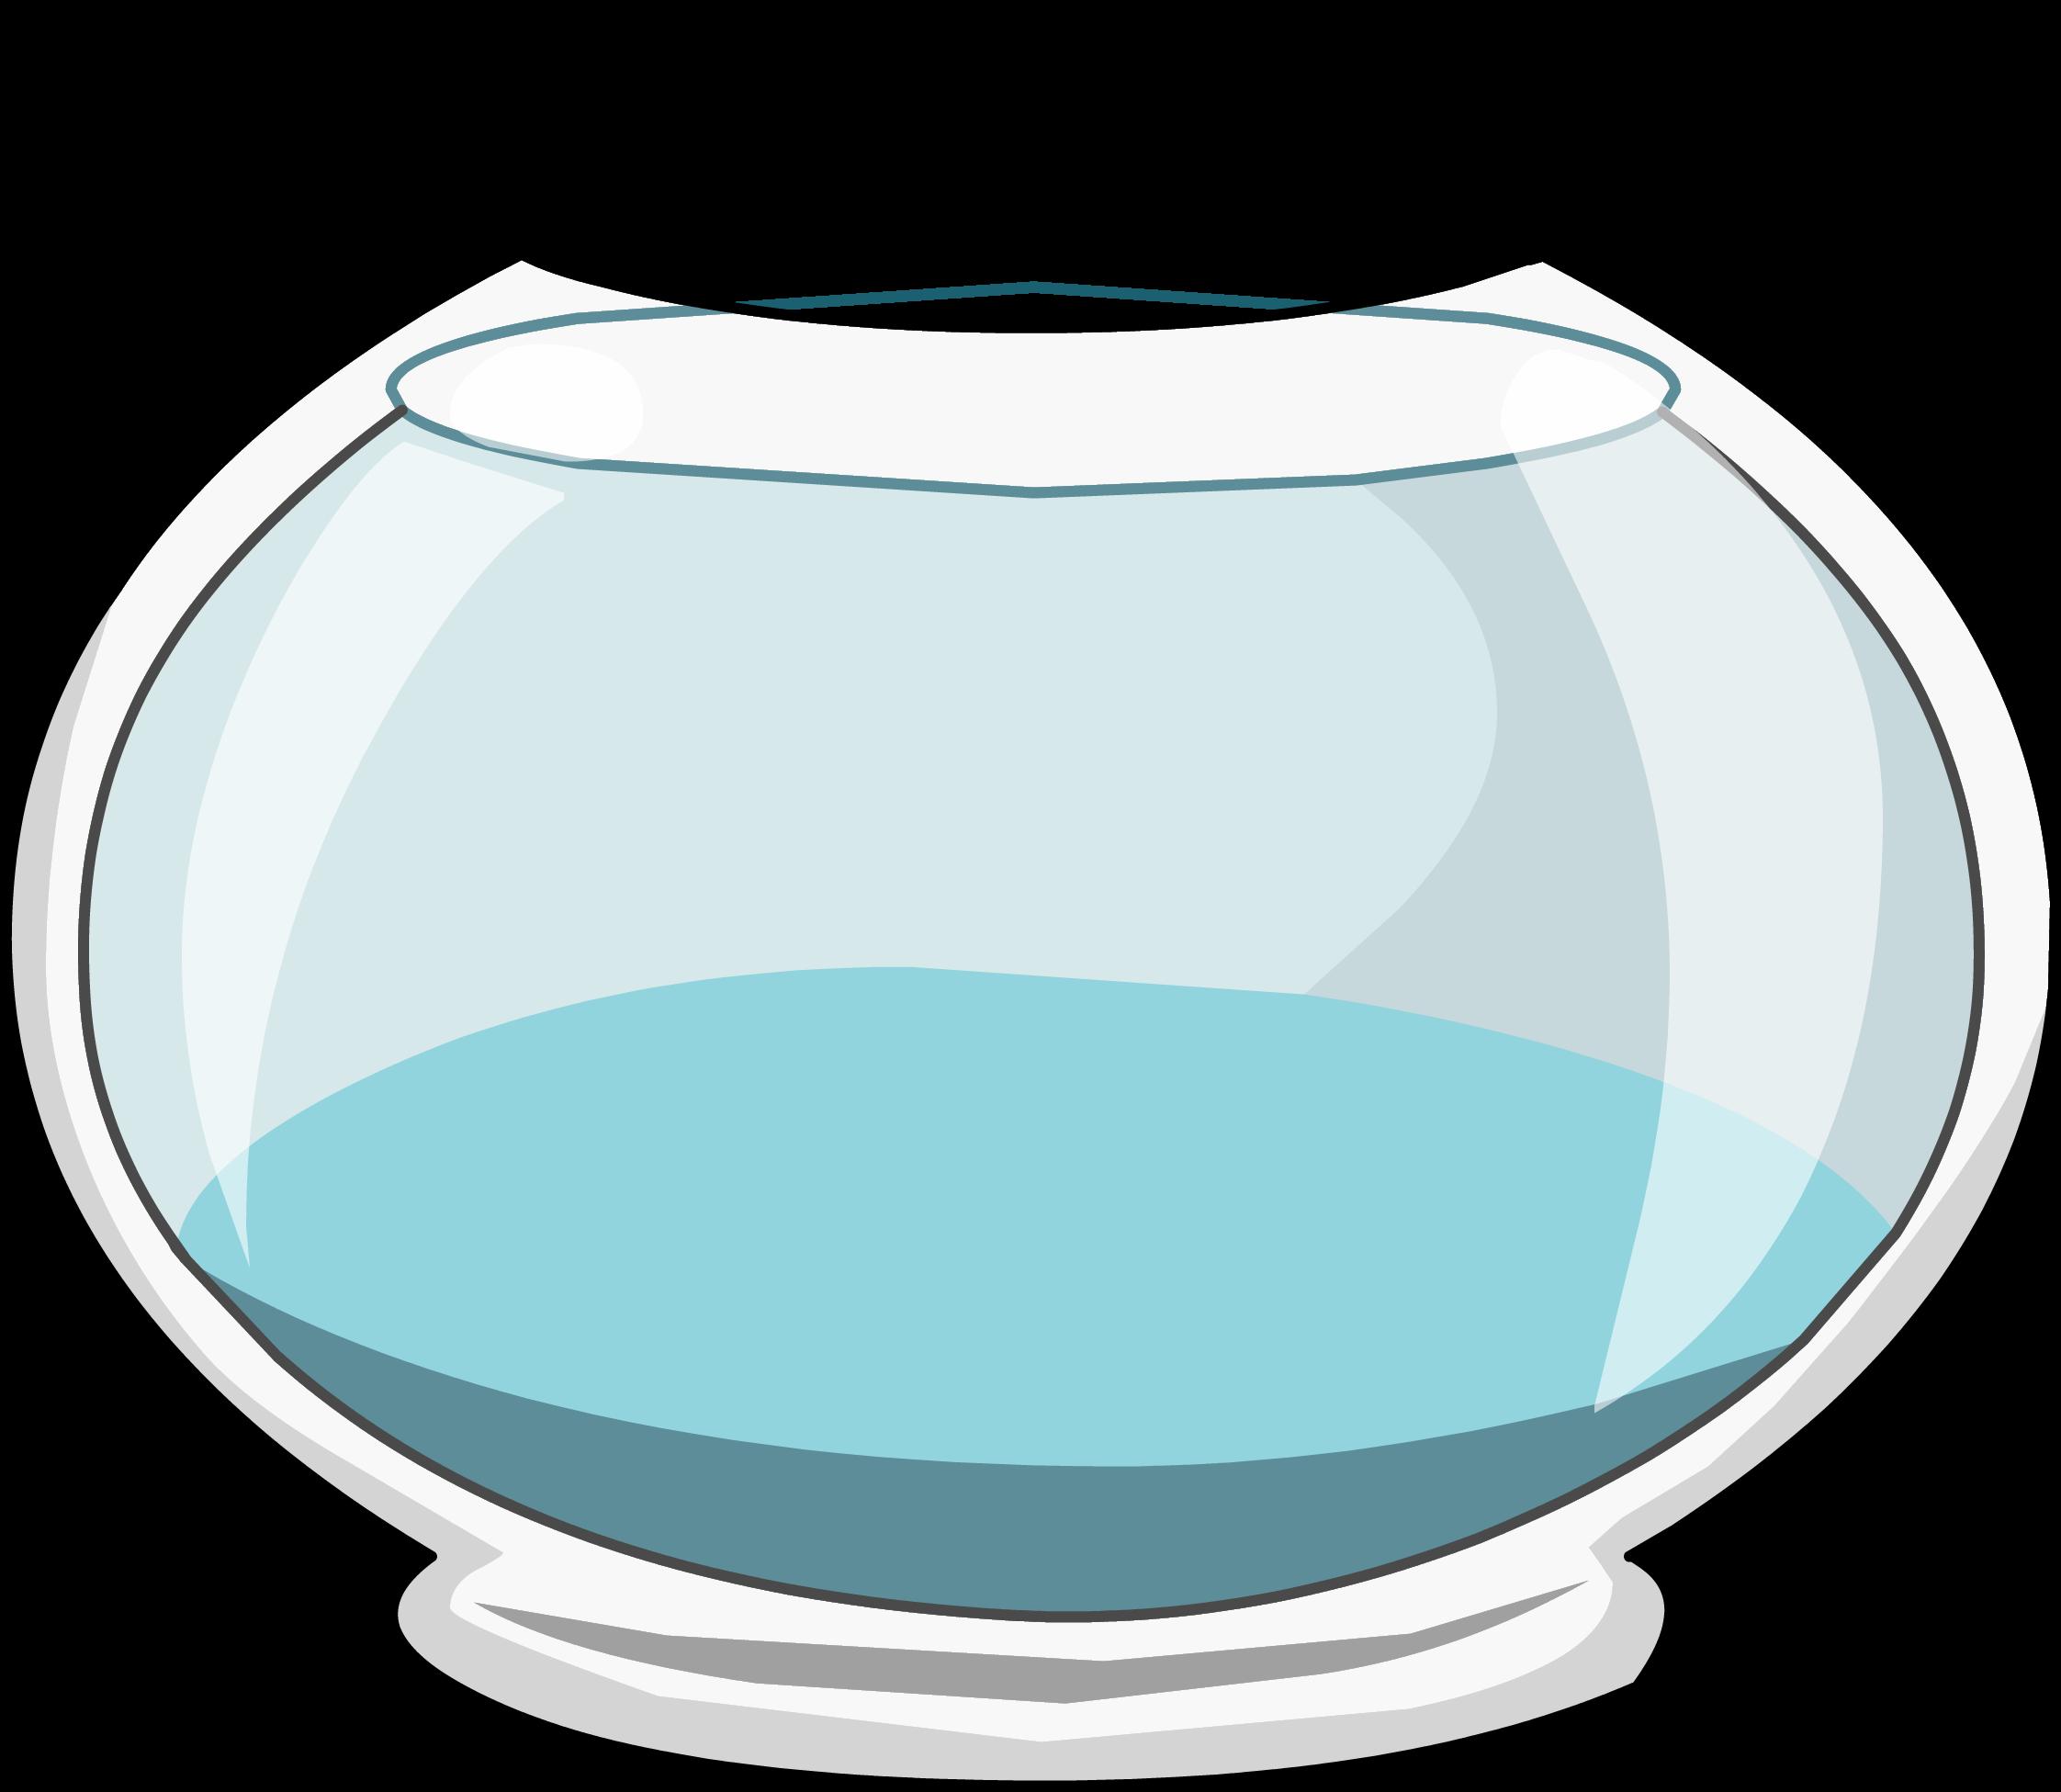 Fish Bowl (igloo)